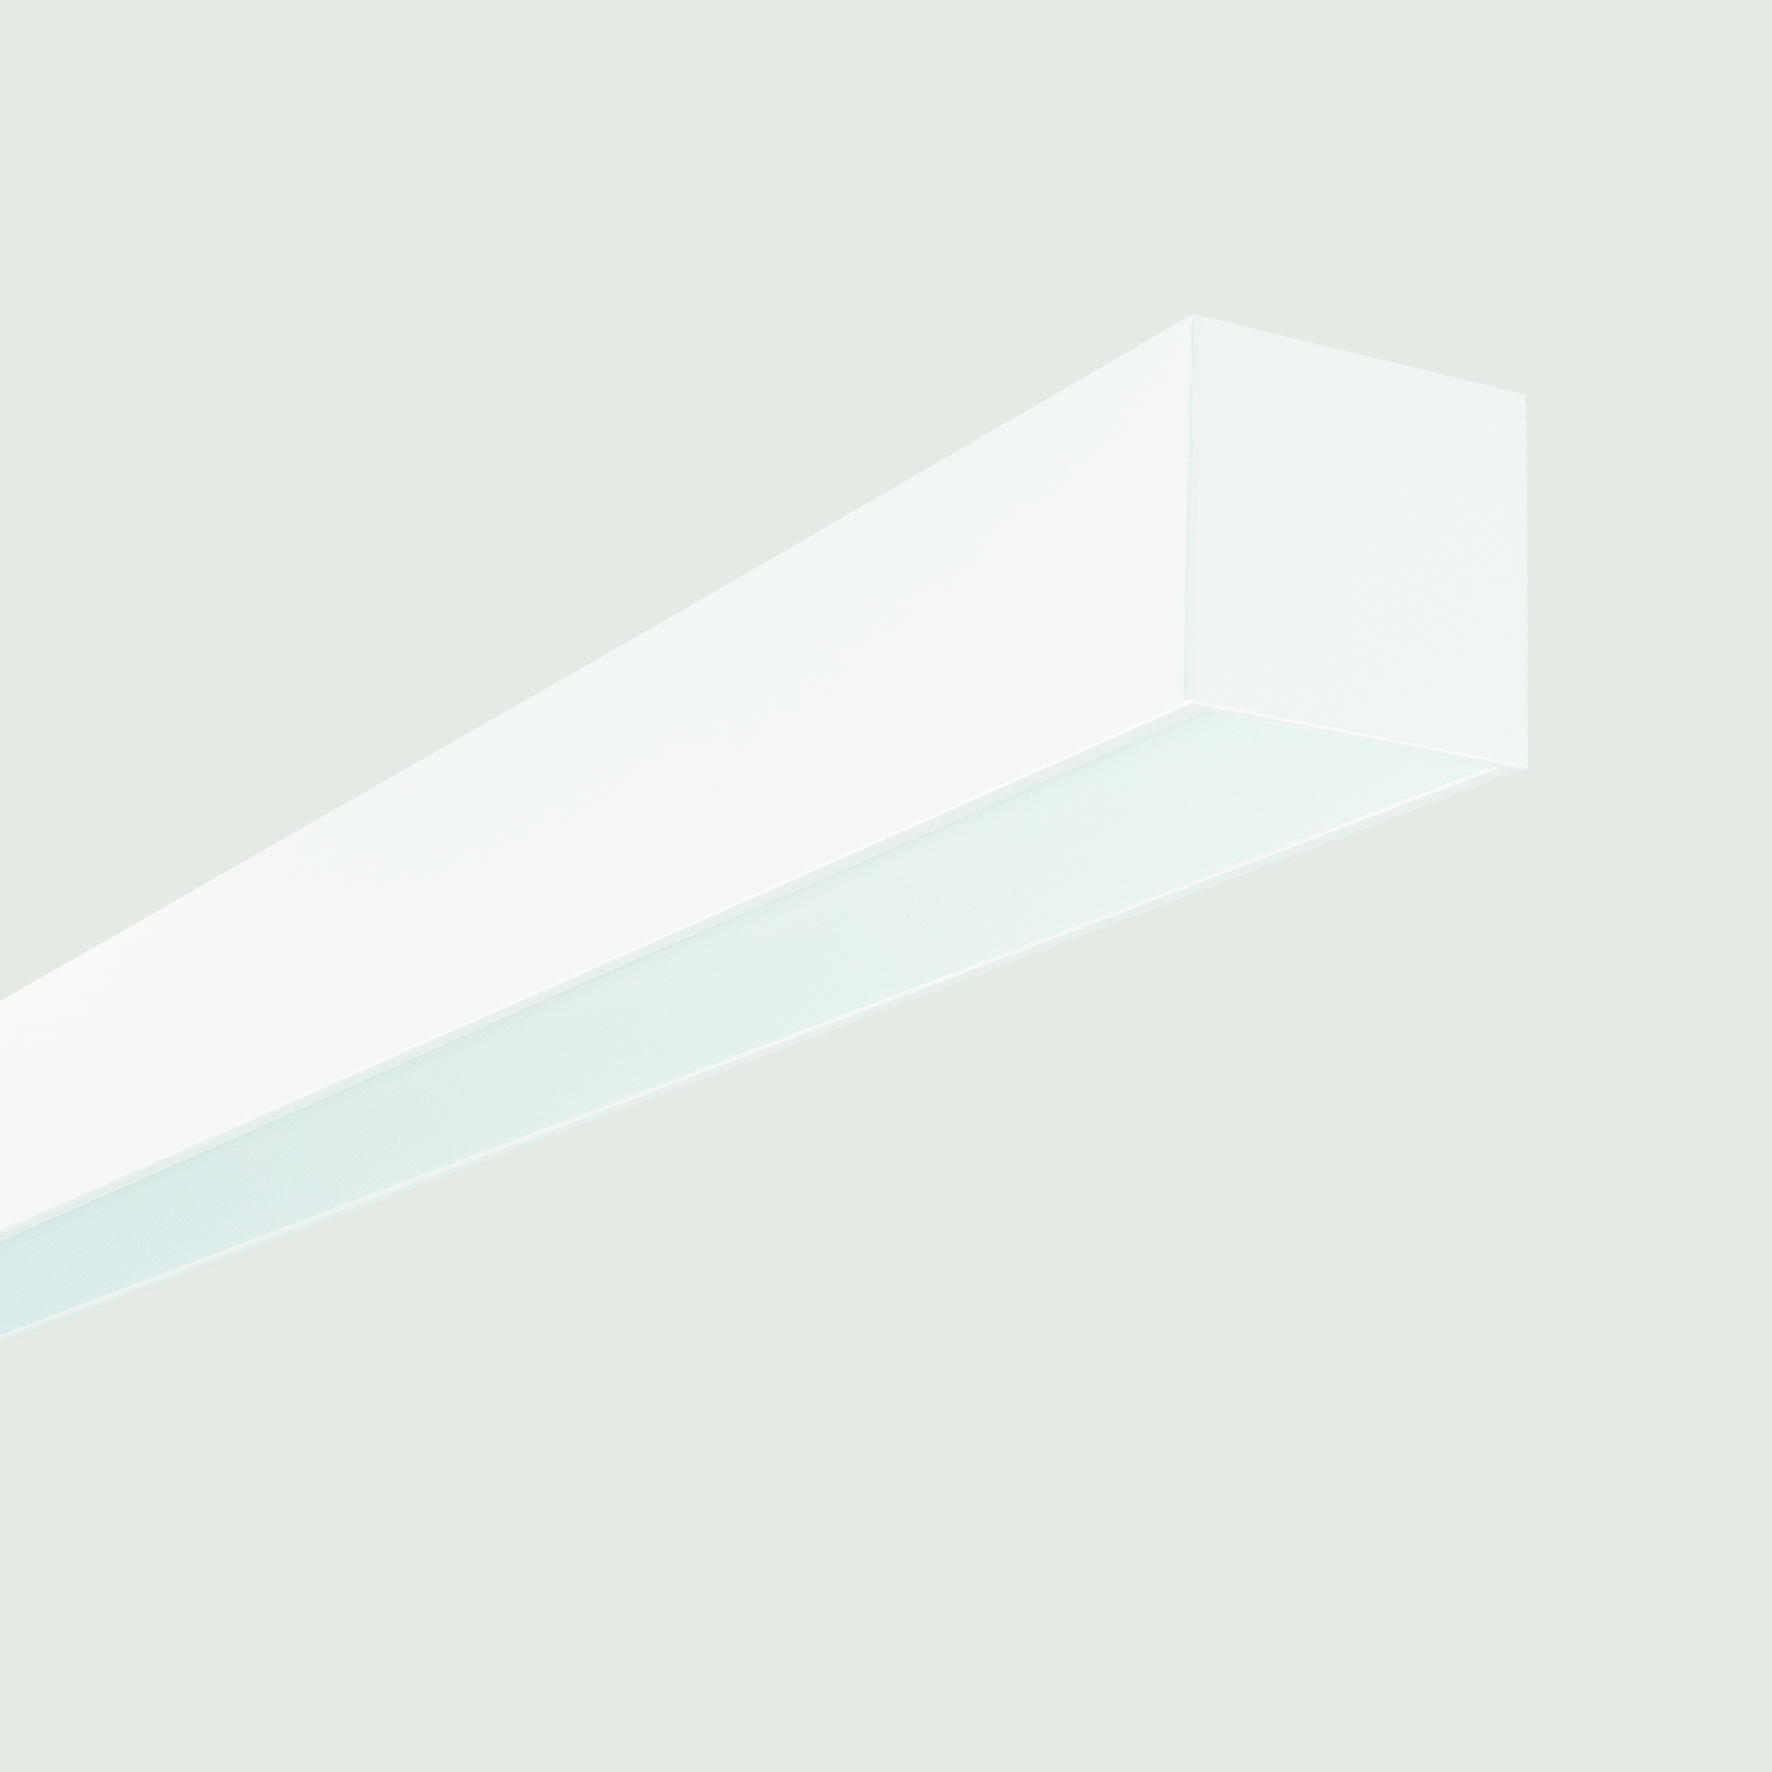 SE70O-profilleuchte-weiß-sml-led